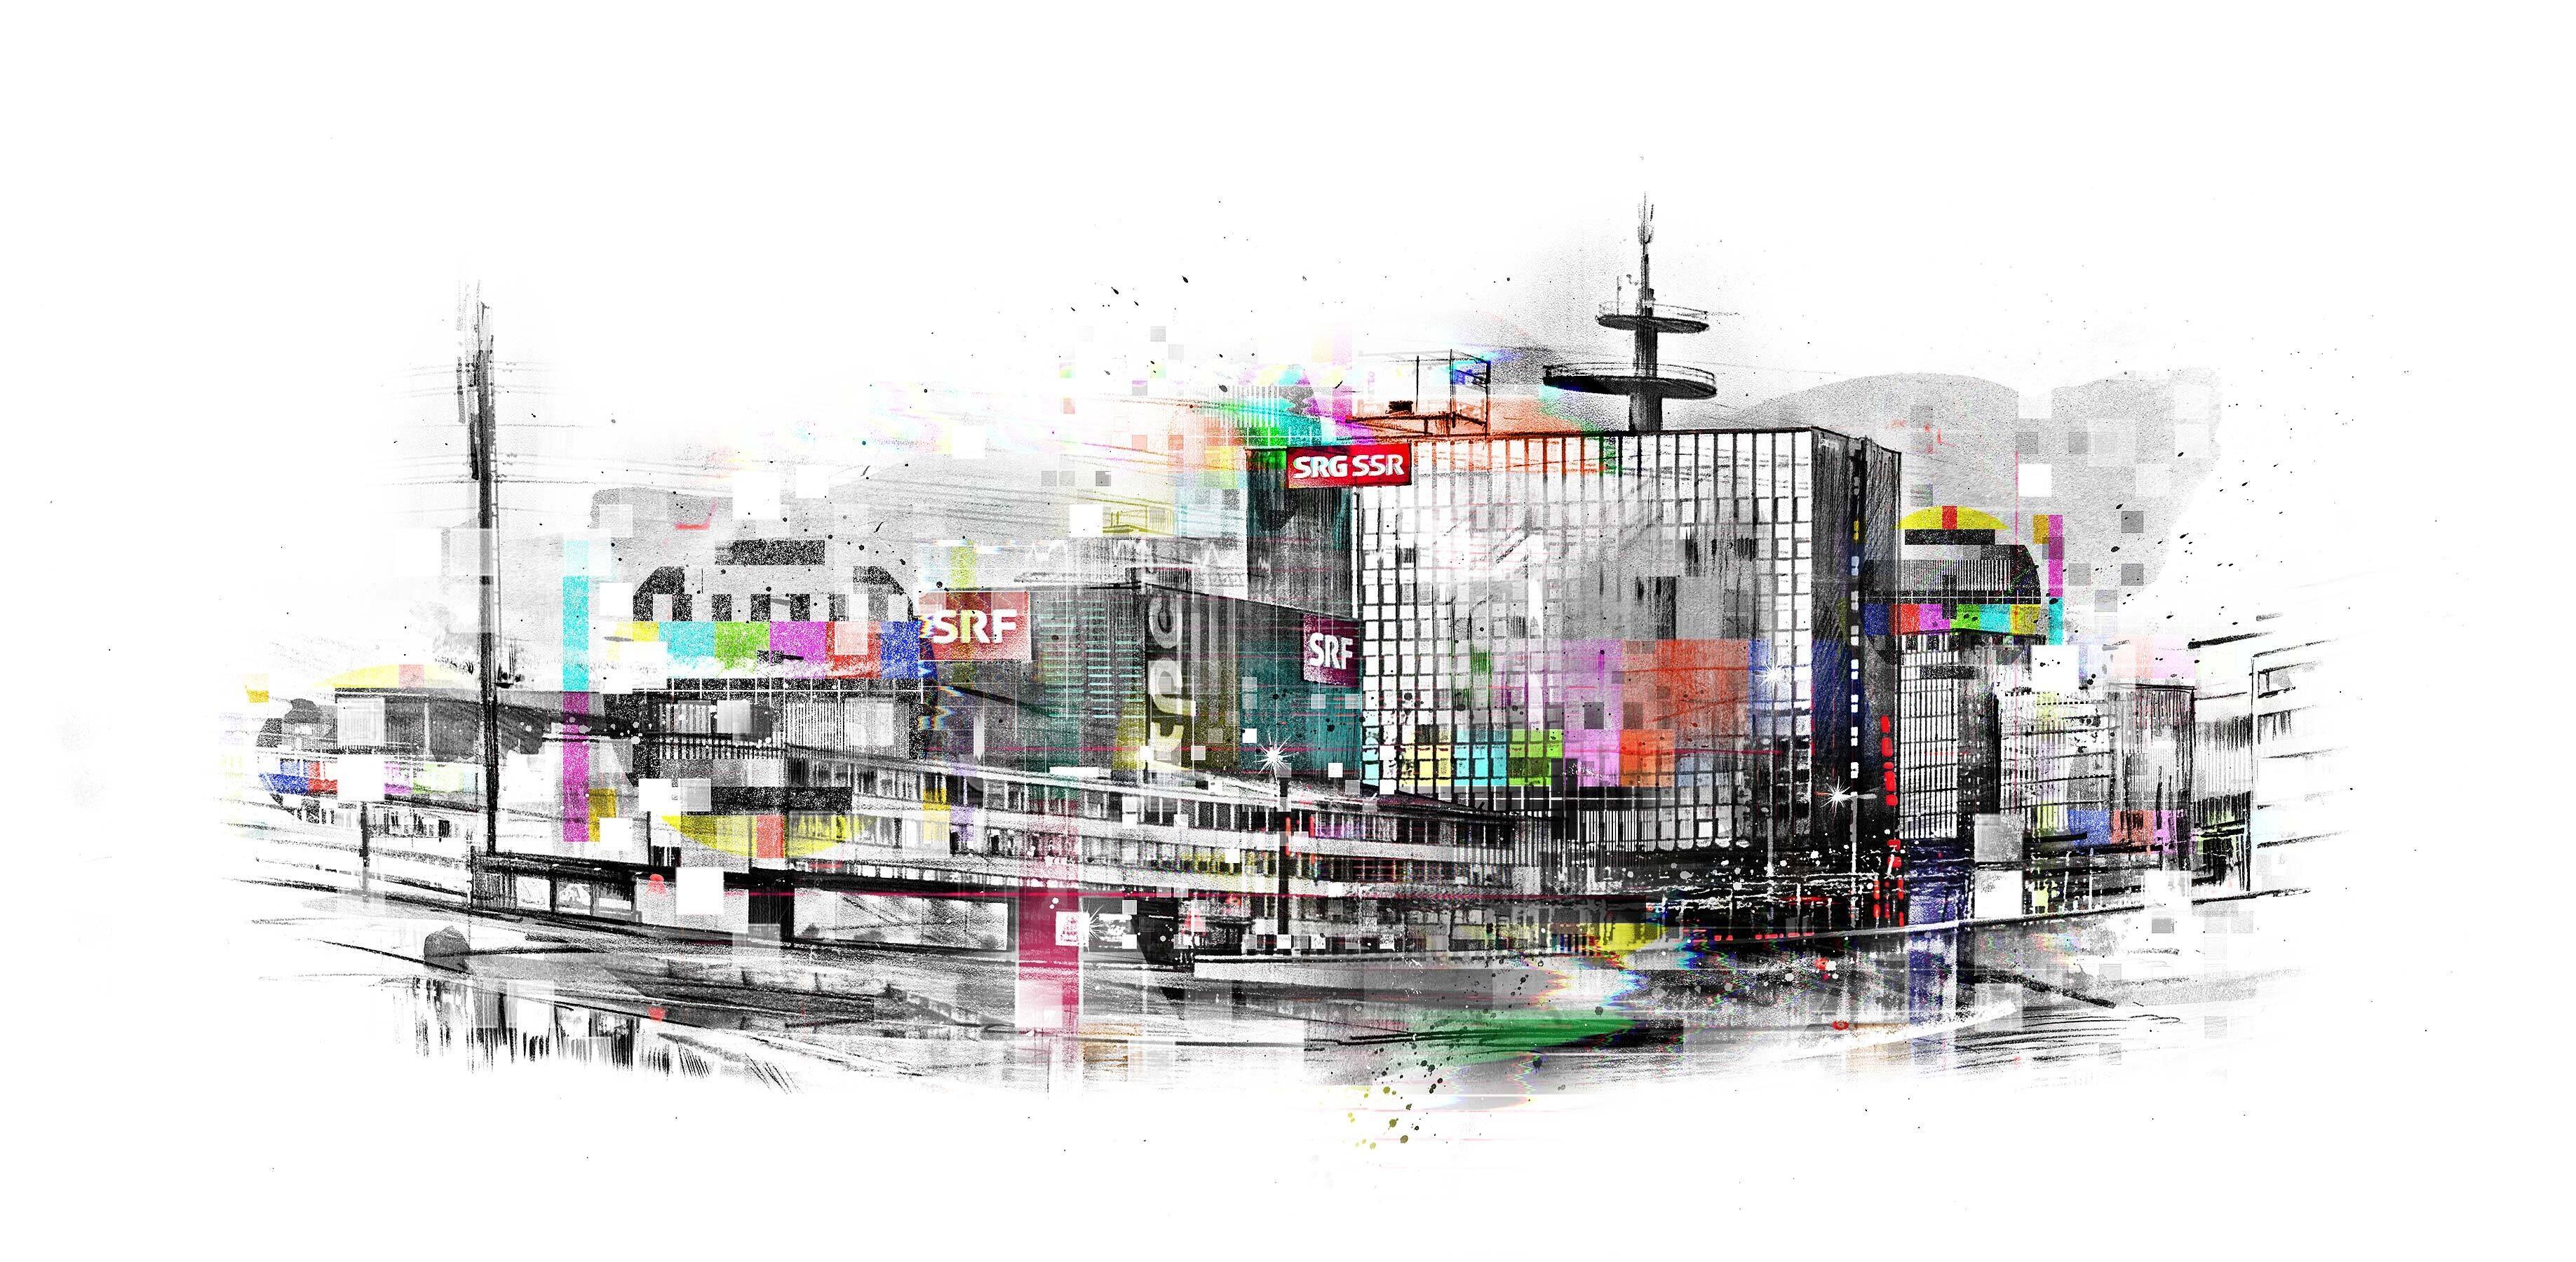 Bilag srg srf illustration - Kornel Illustration   Kornel Stadler portfolio